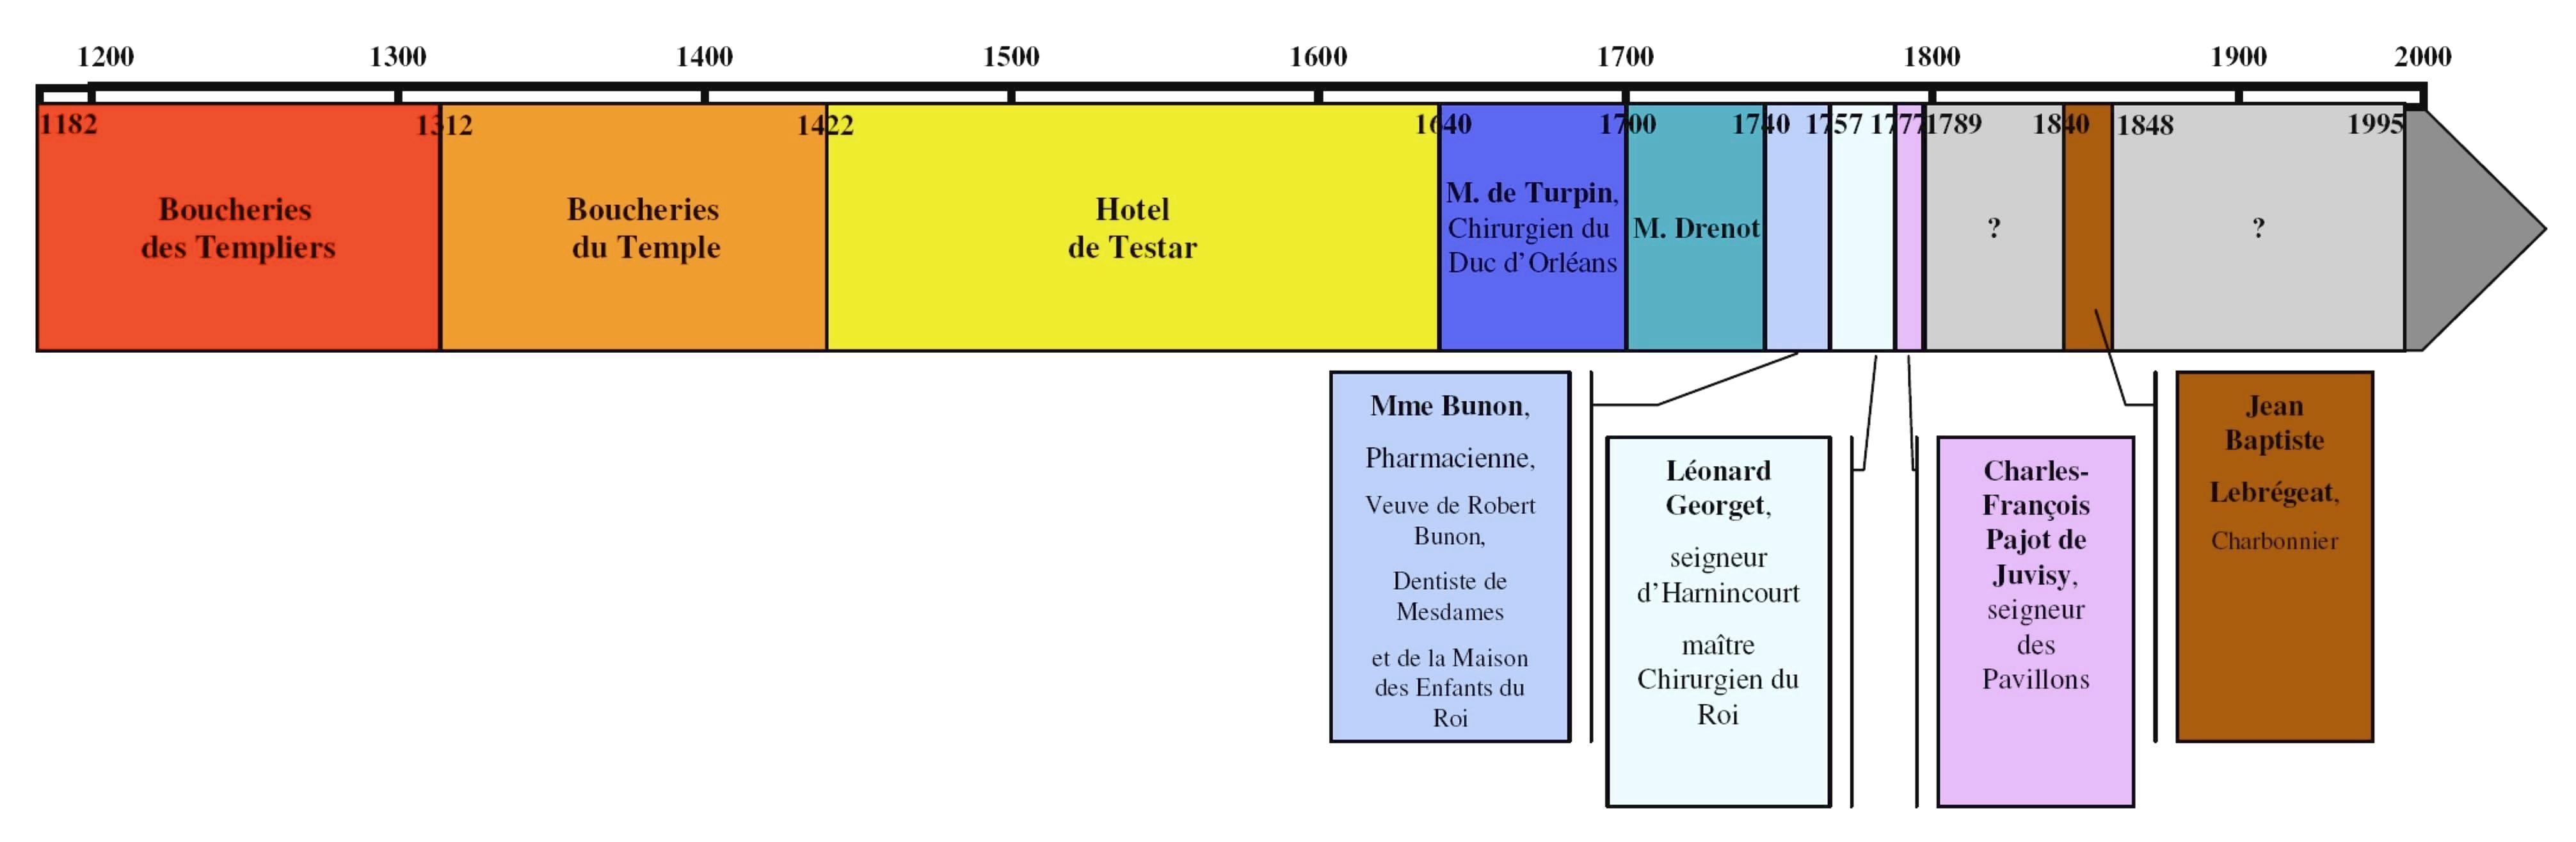 chronologie  dates